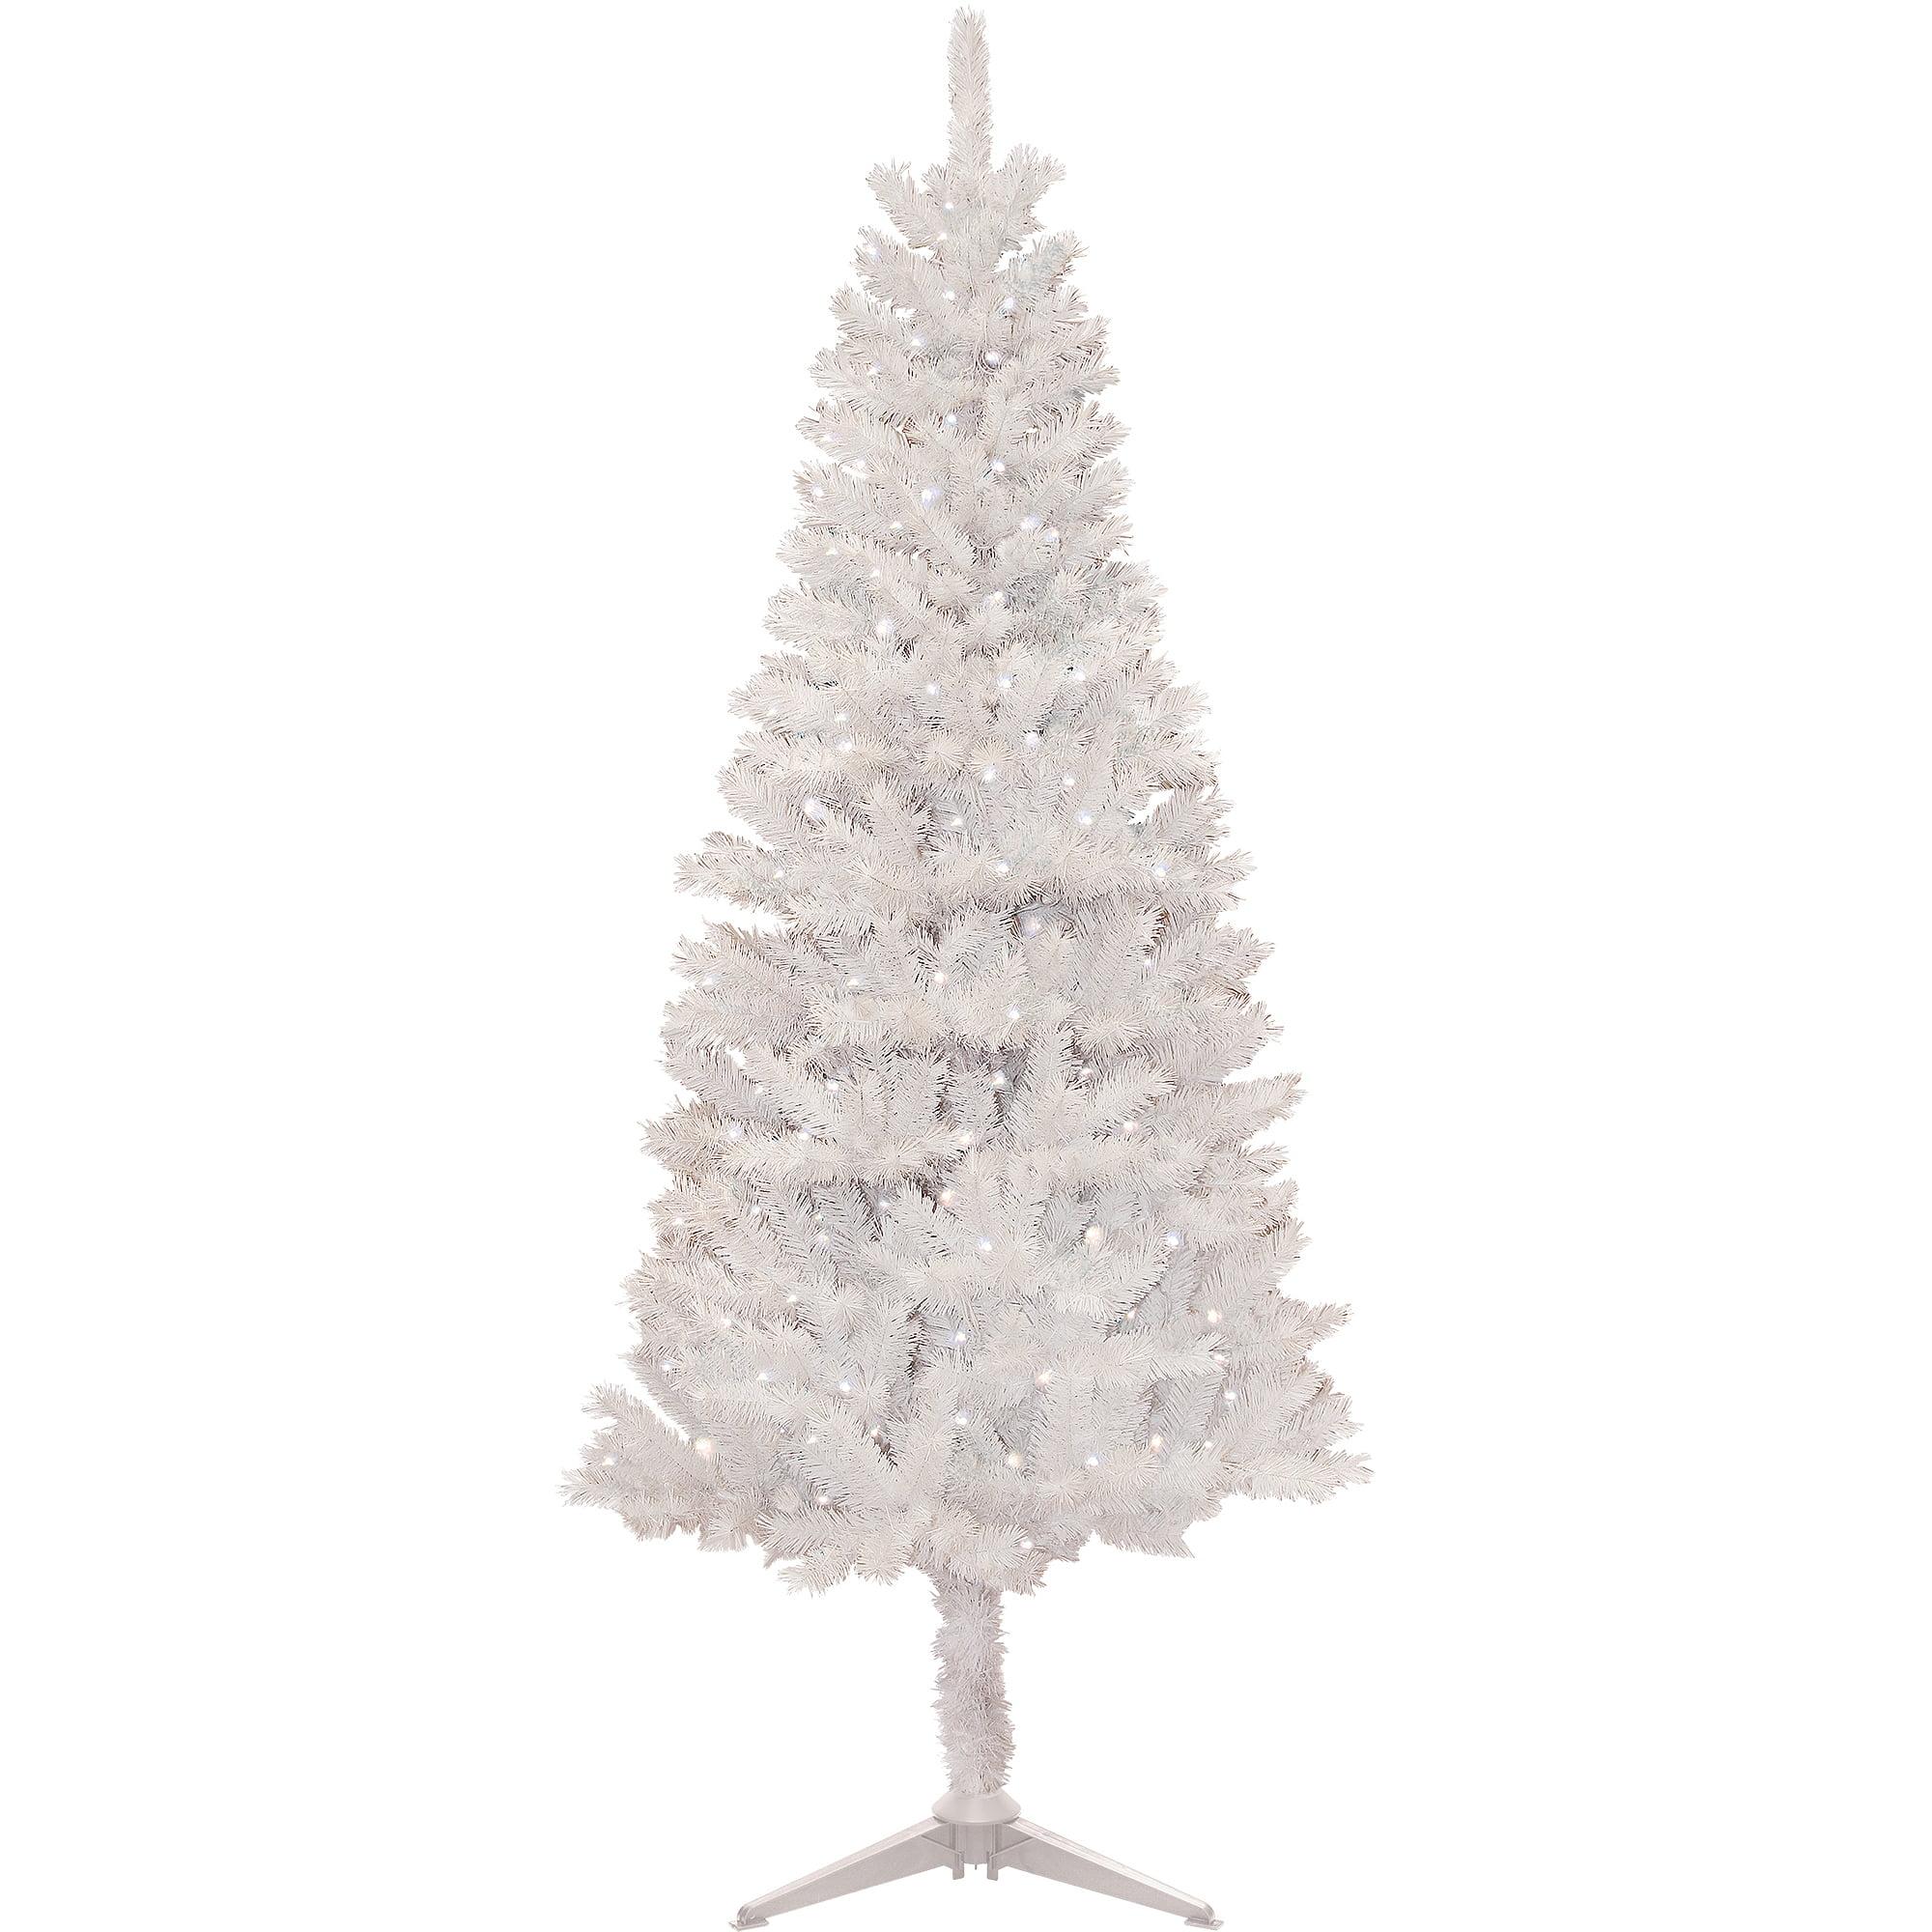 White Christmas Trees - Walmart.com